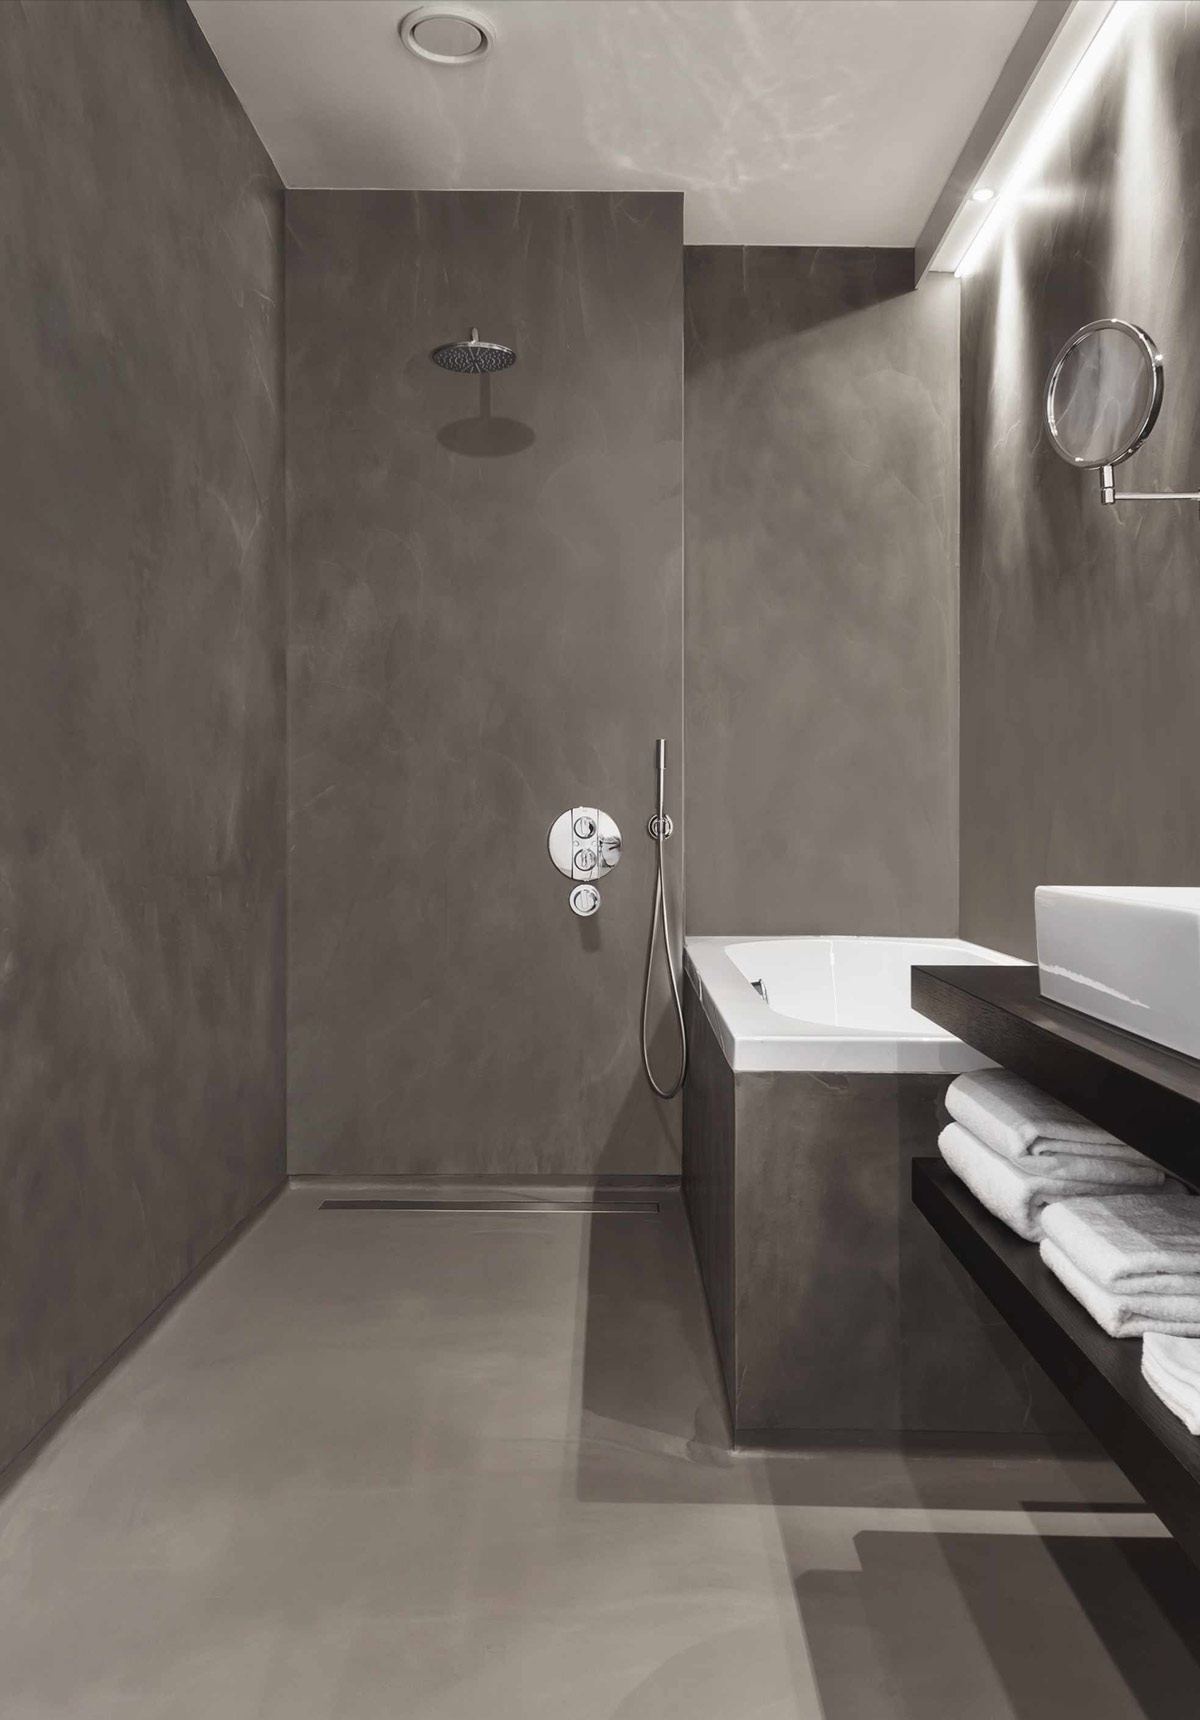 Badezimmer Spachteln Statt Fliesen